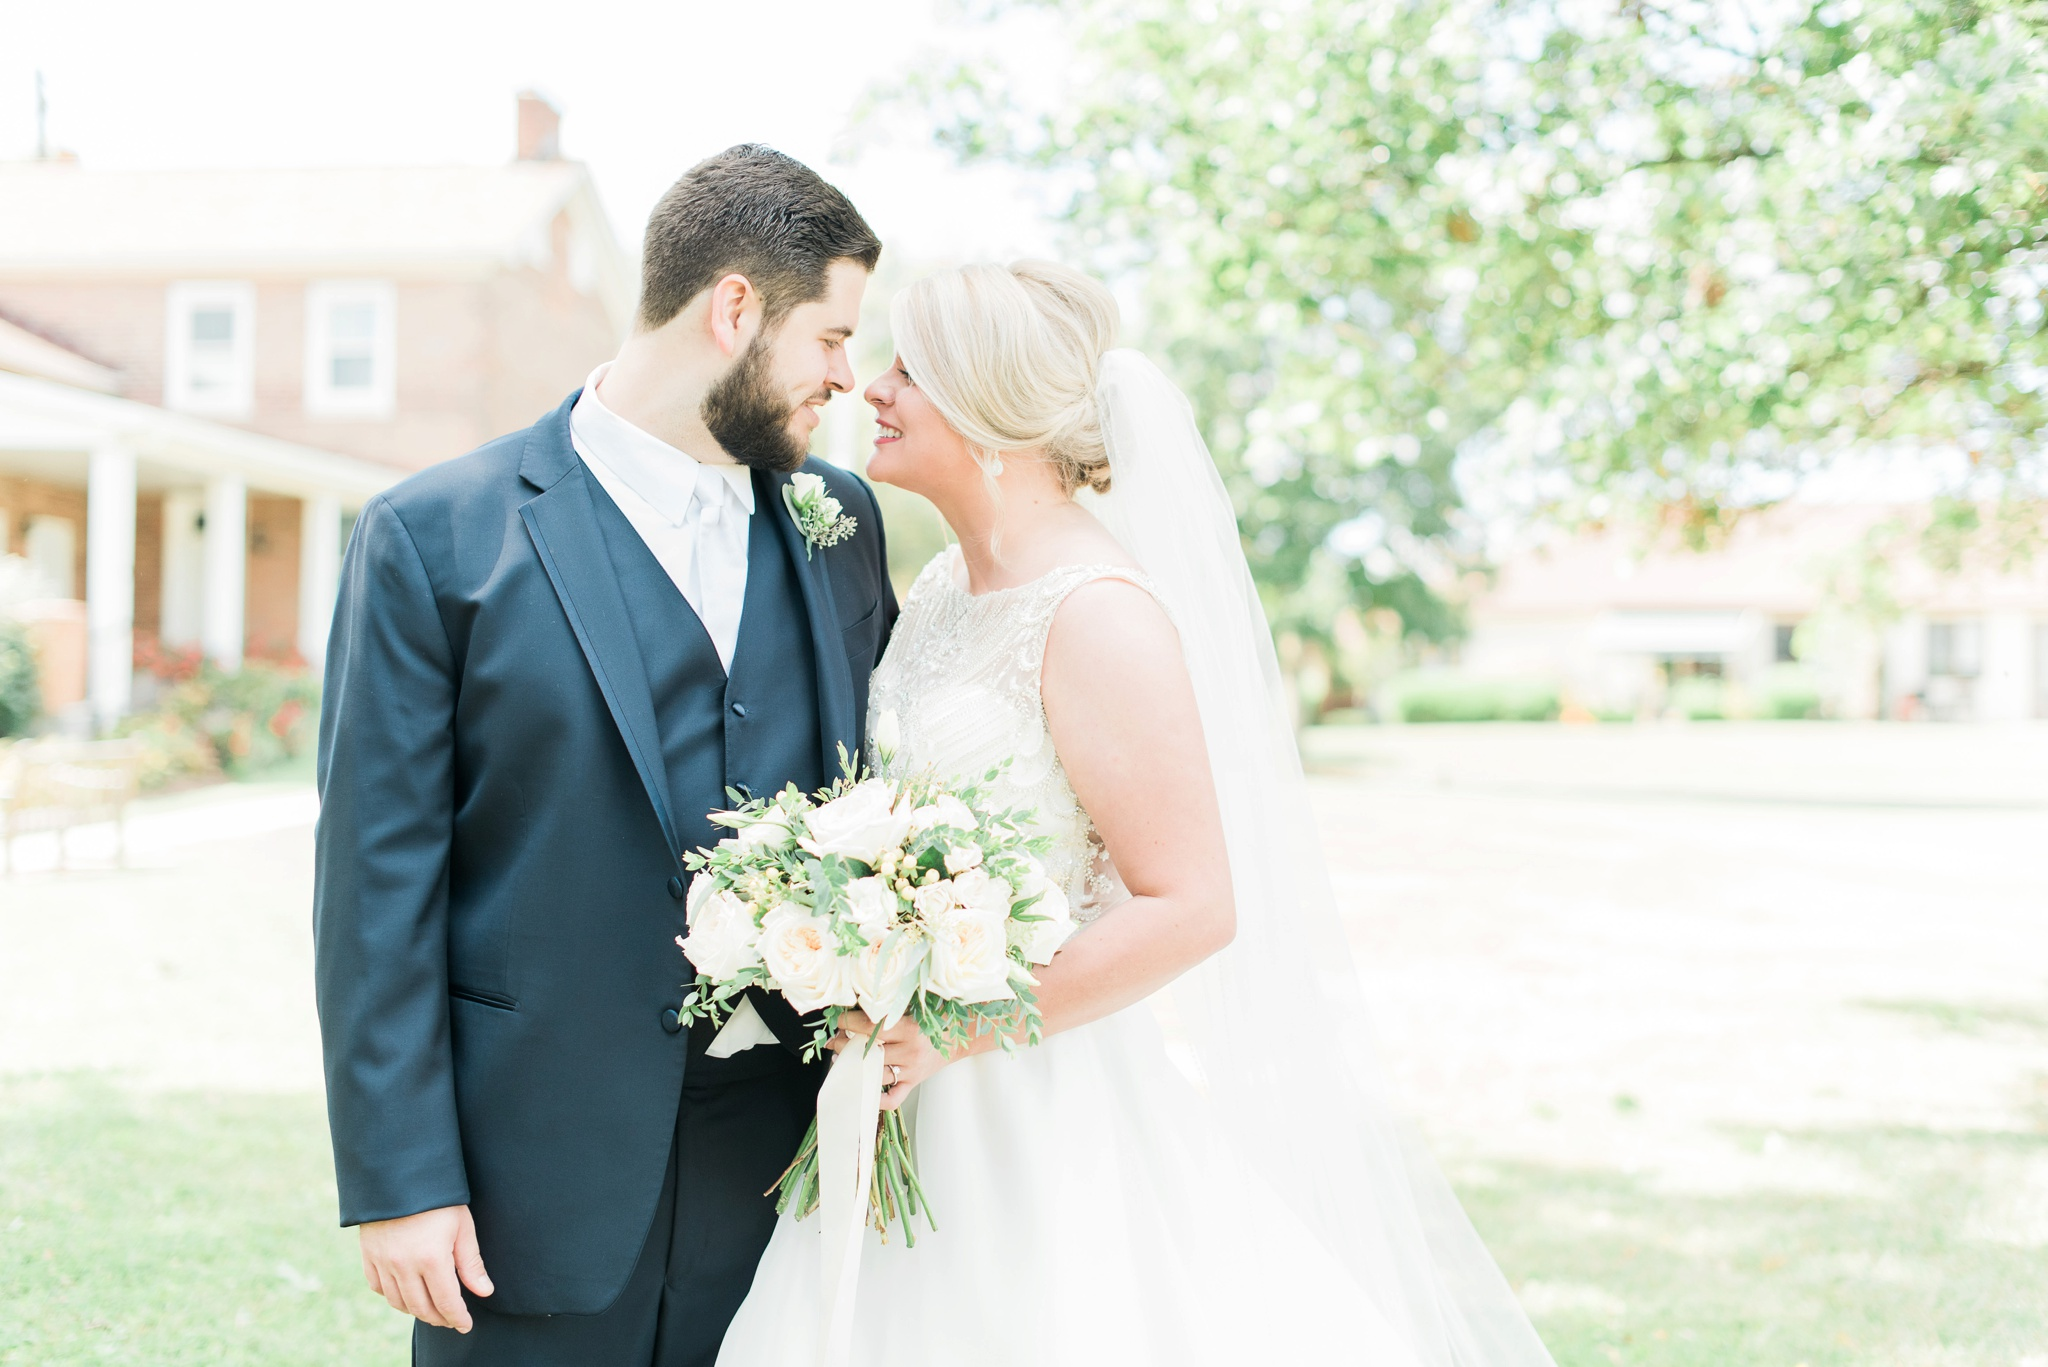 aladdin-shrine-center-wedding-grove-city-ohio-amber-jared_0042.jpg